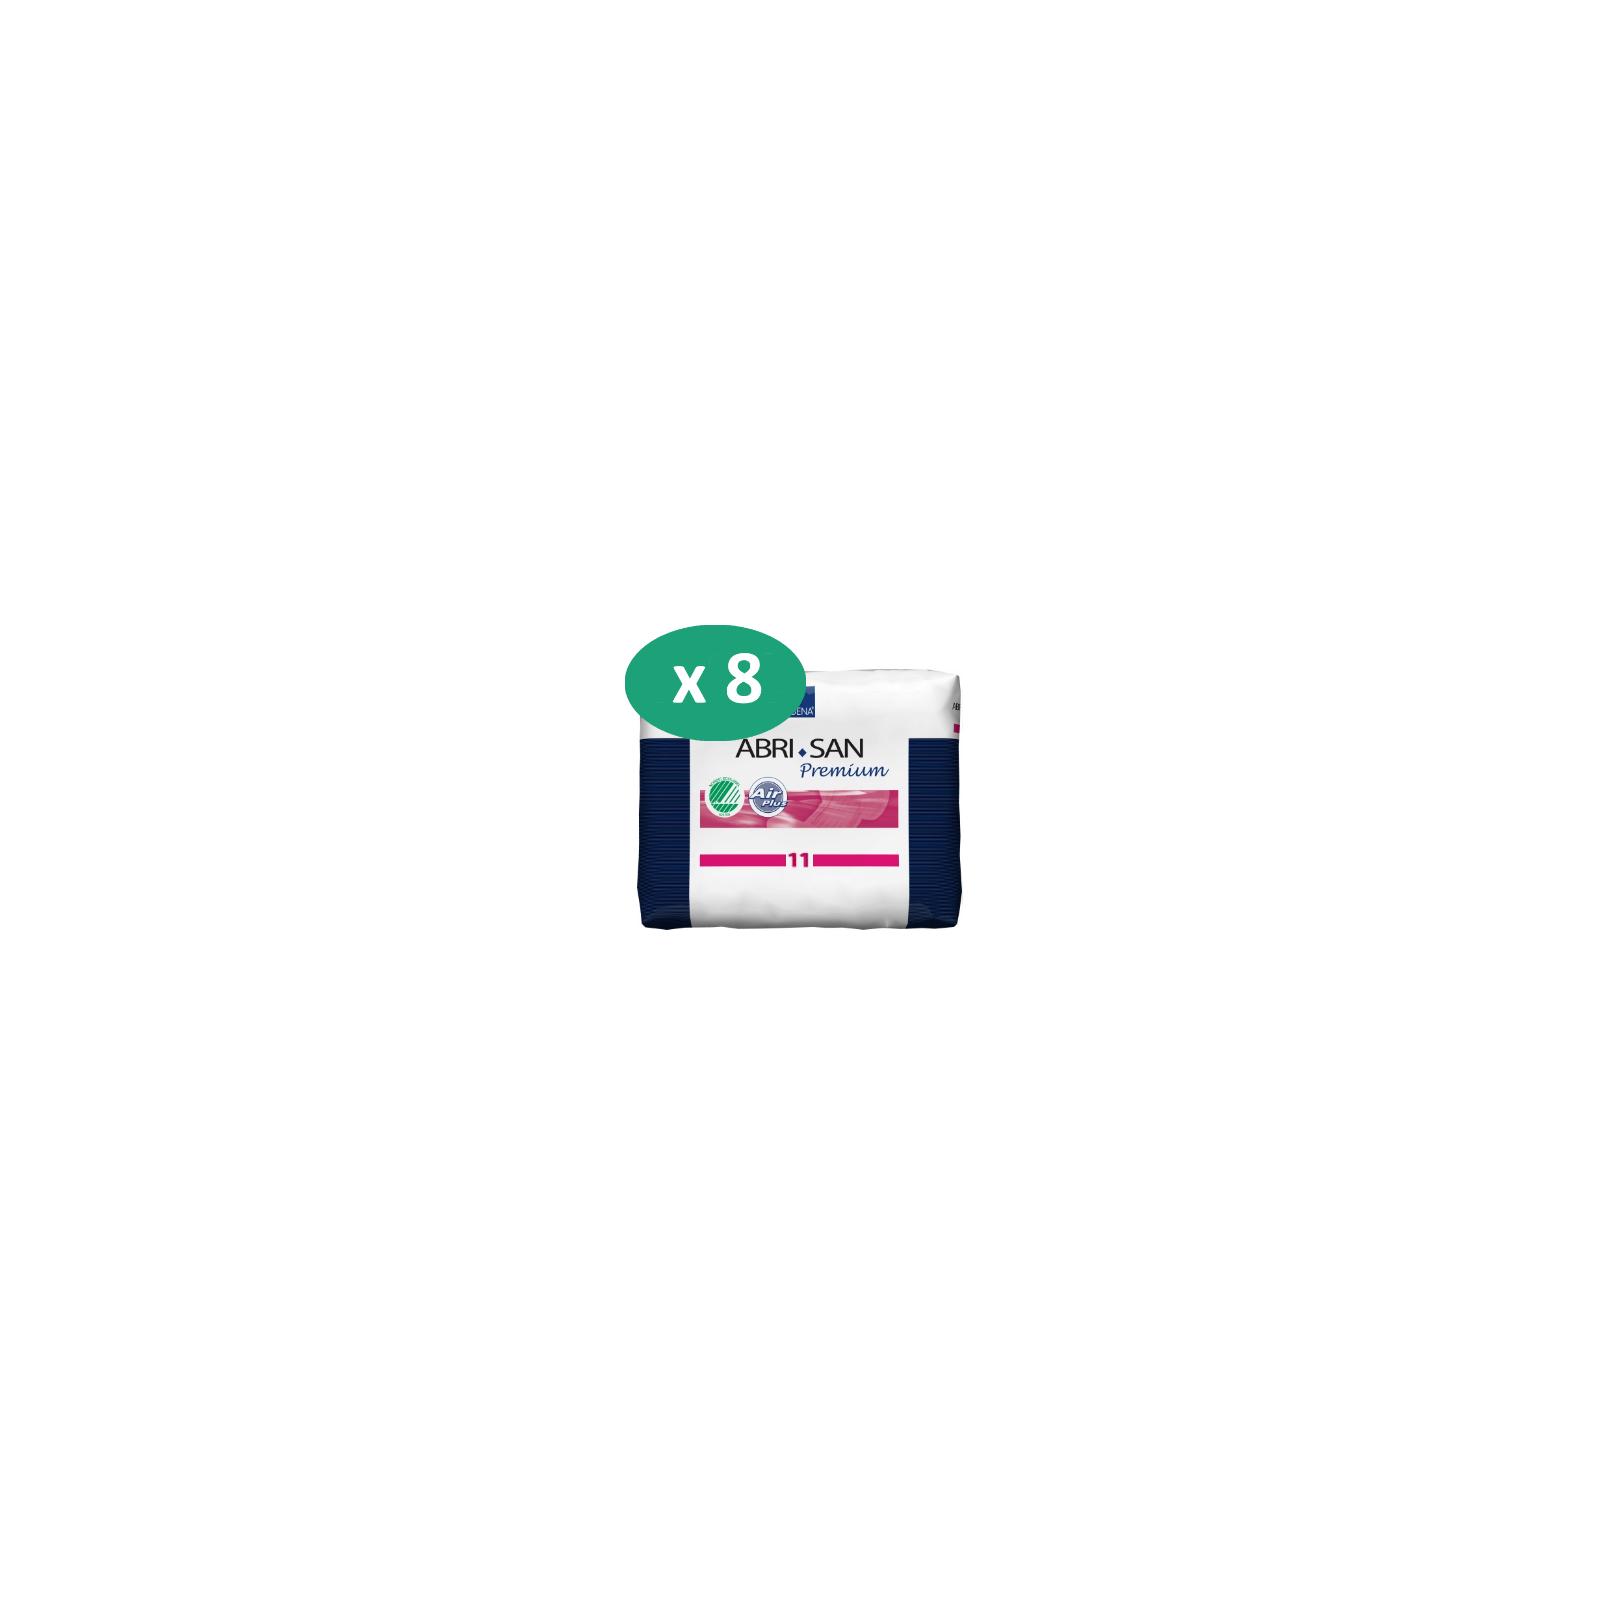 ABENA Abri-San Premium 11| SenUp.com